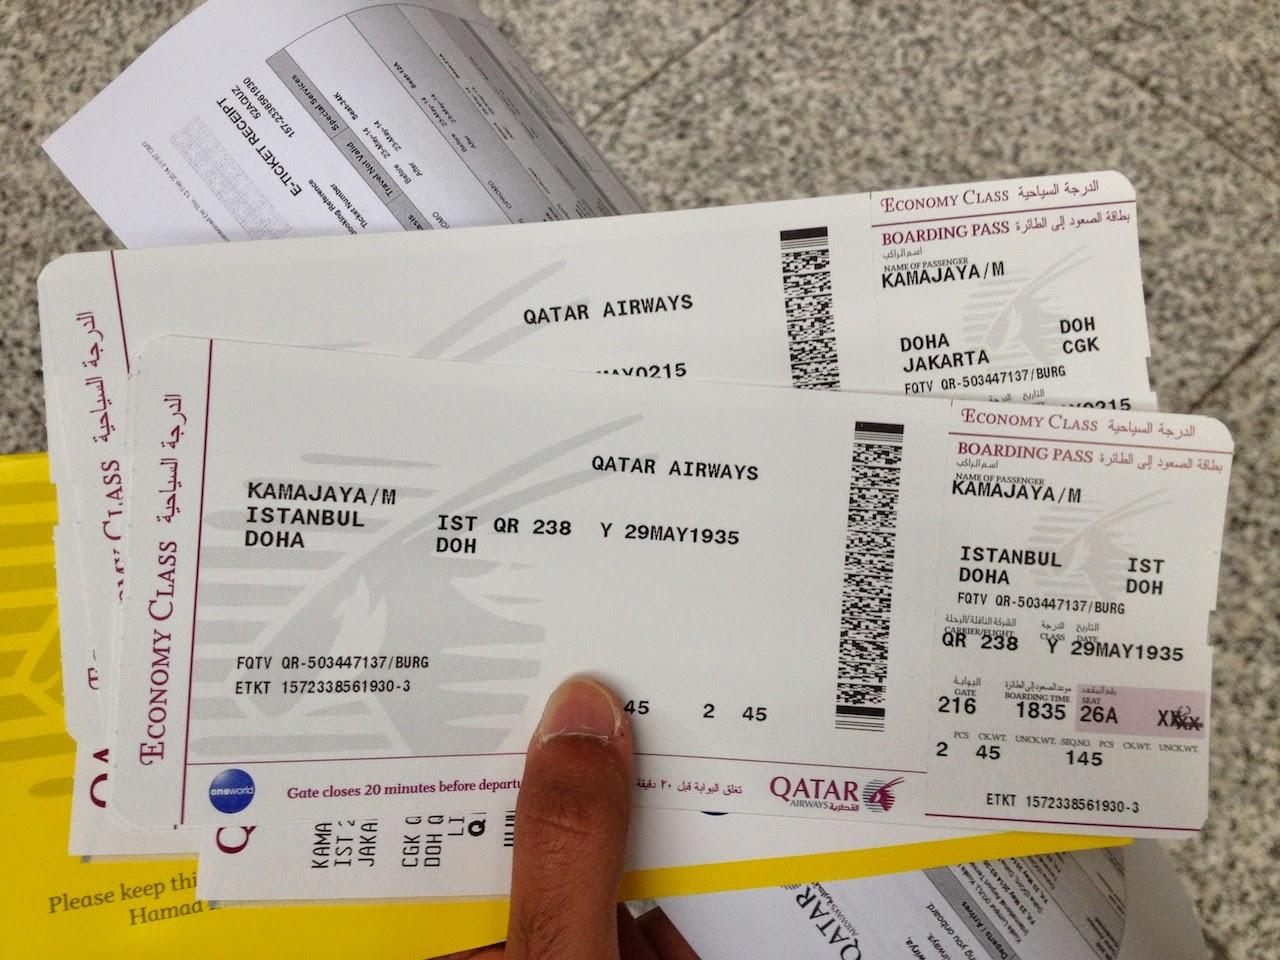 Terbang Dengan Qatar Airways The Story Of My Life Tiket Jakarta Ke Jepang Pergi Pulang Garuda Indonesia Boarding Pass Ist Doh Dan Cgk